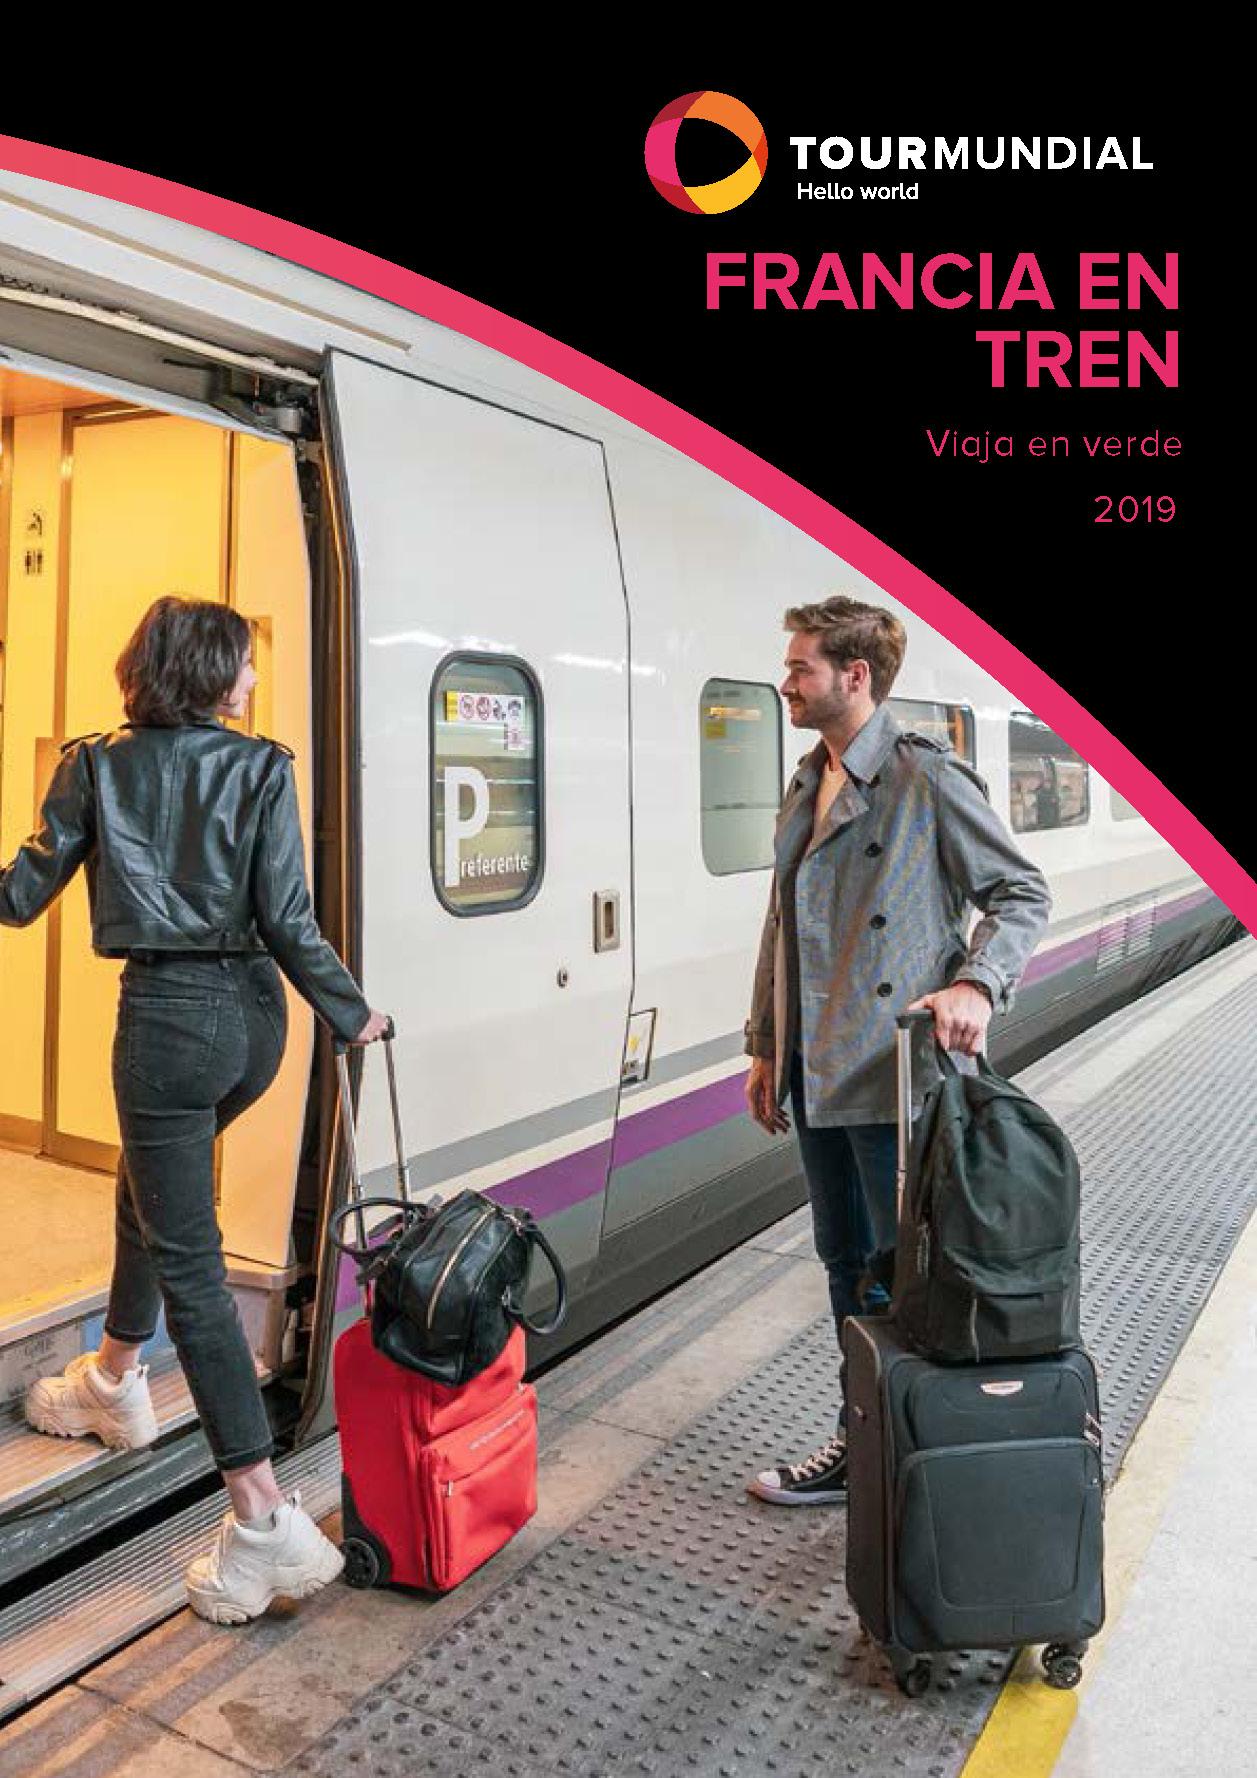 Diptico Tourmundial Francia en Tren 2019